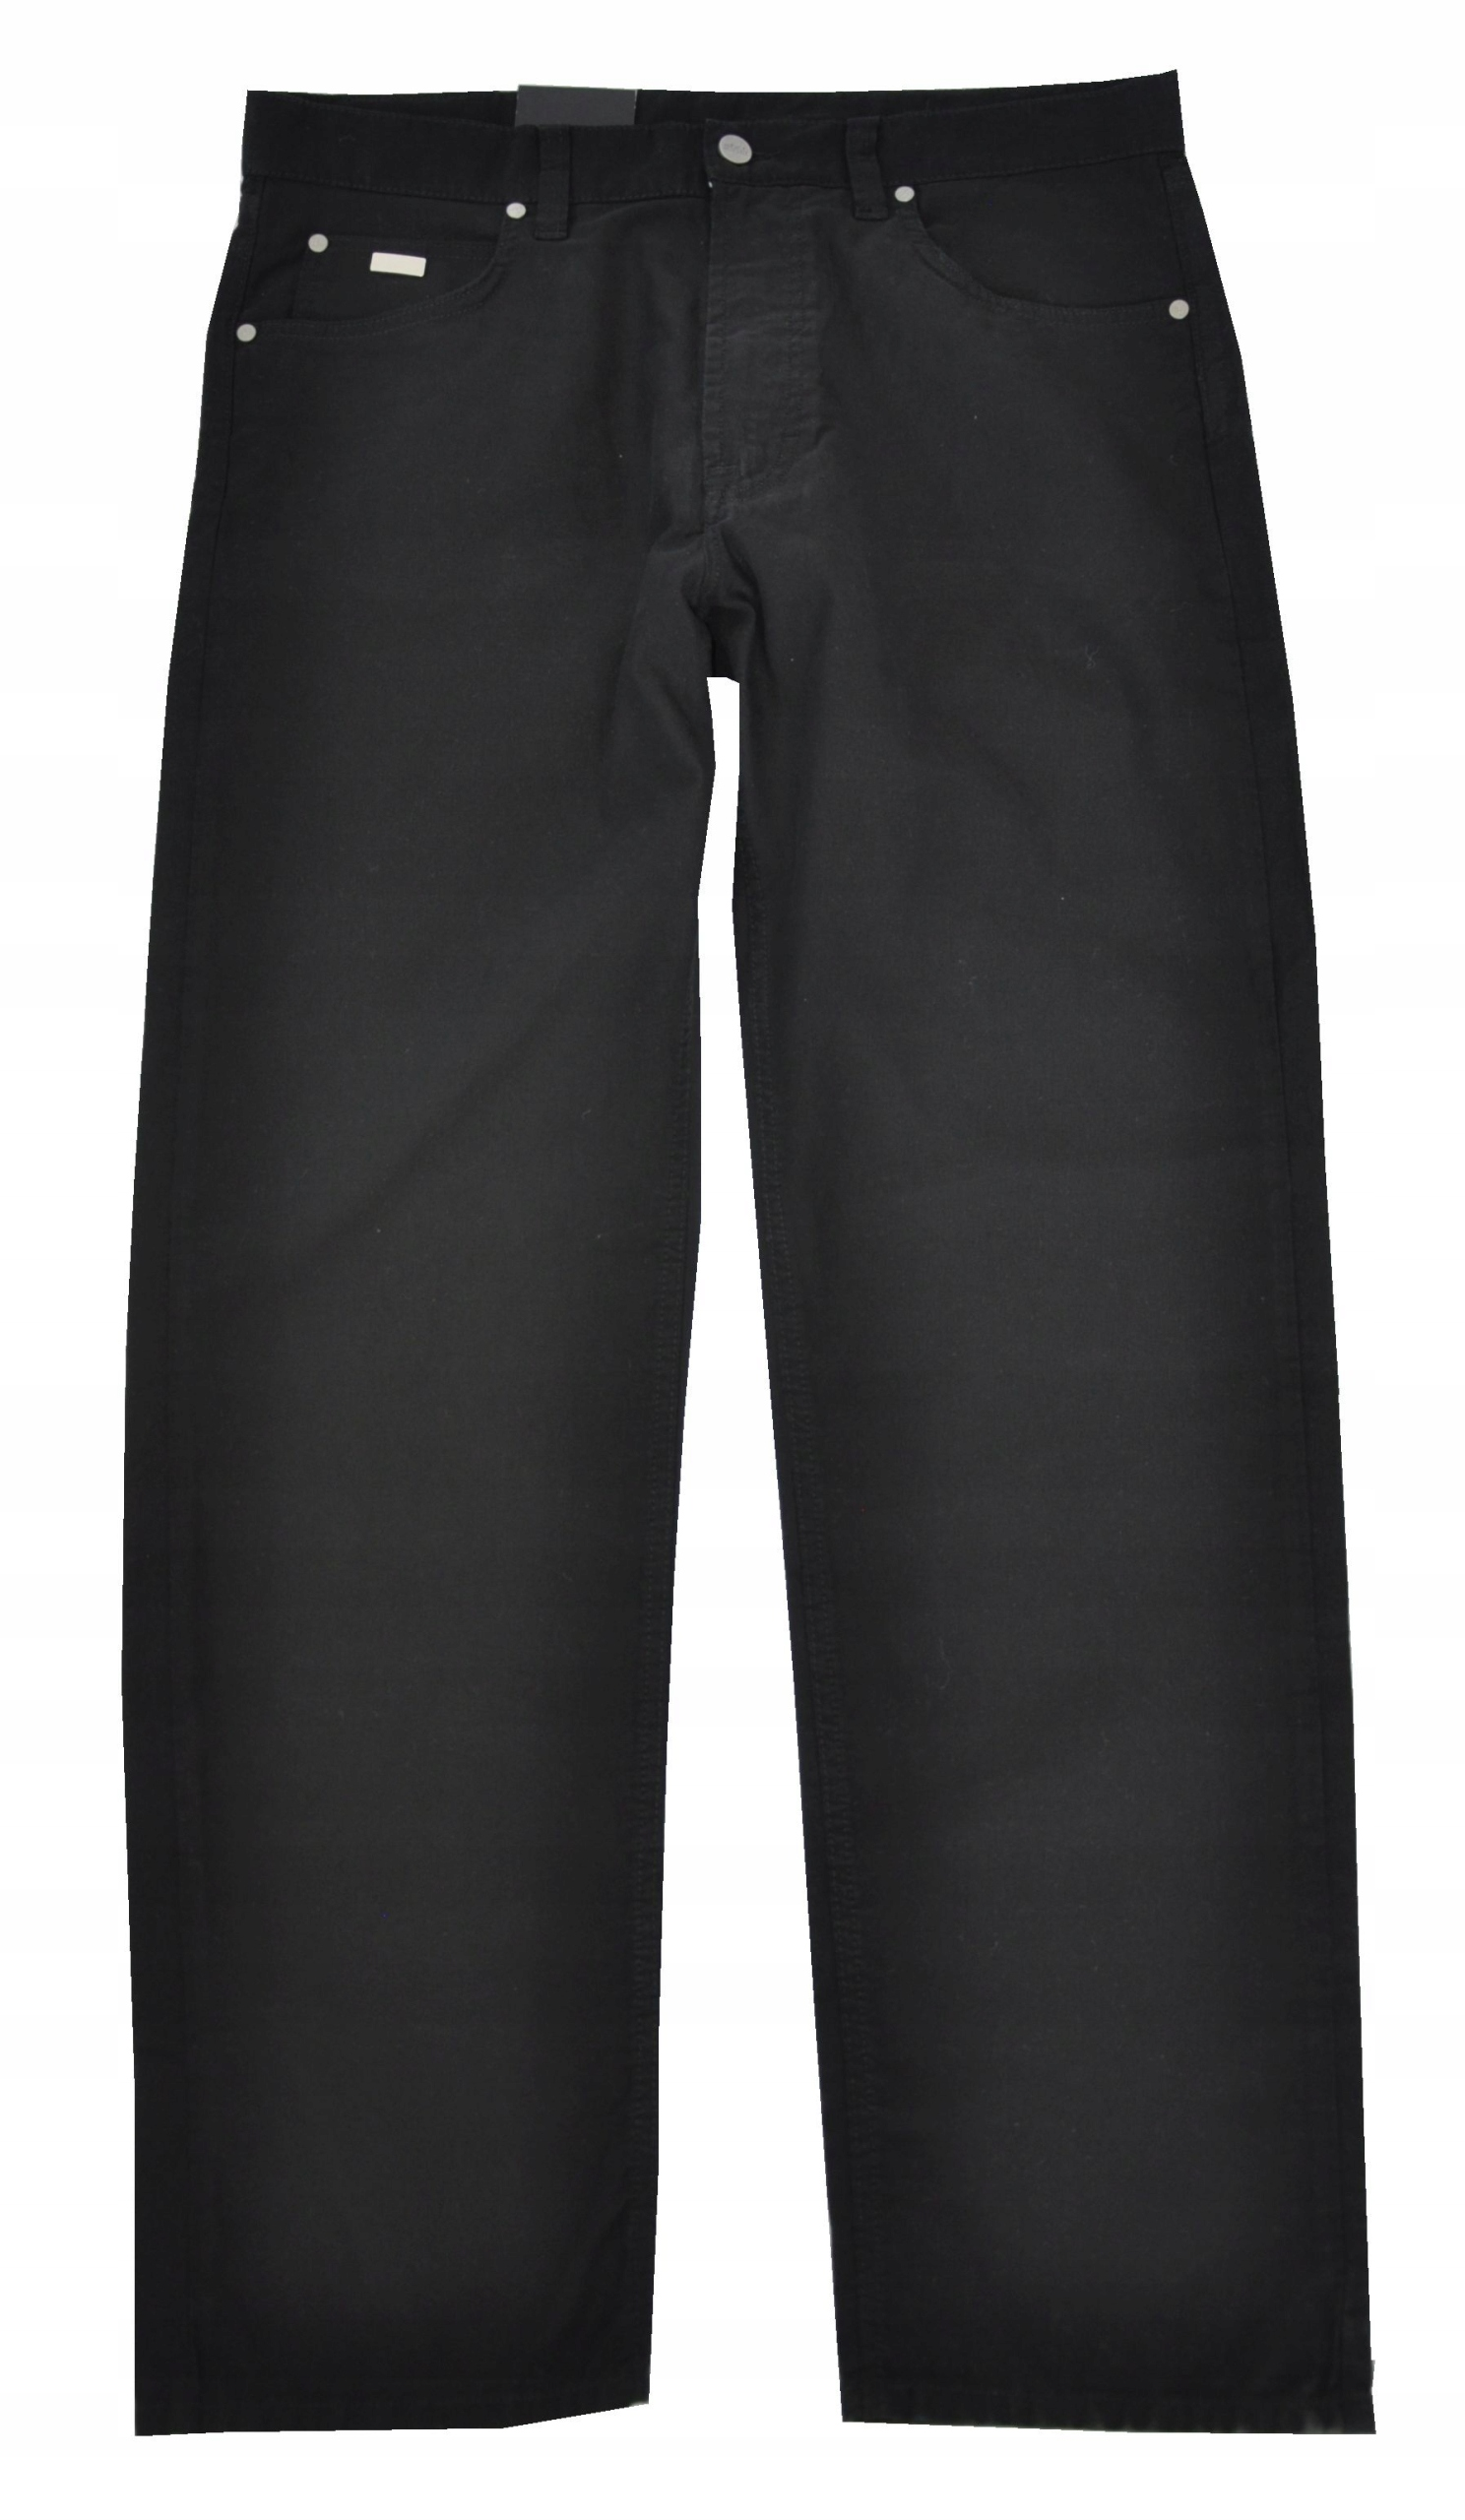 HUGO BOSS spodnie męskie comfort fit 36/32 czarne